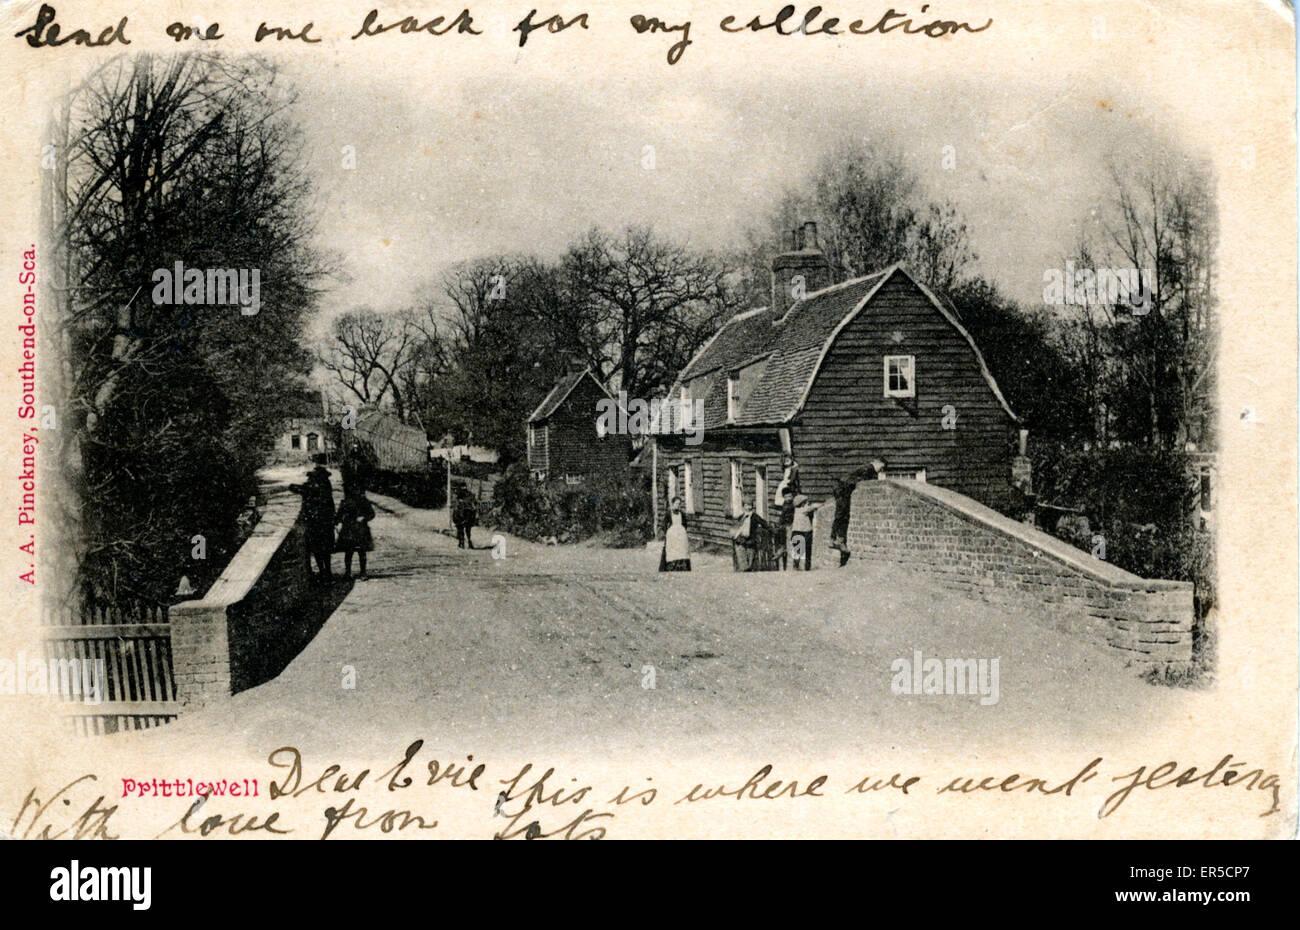 Bridge, Prittlewell, Southend-on-Sea, Essex, England.  1900s - Stock Image